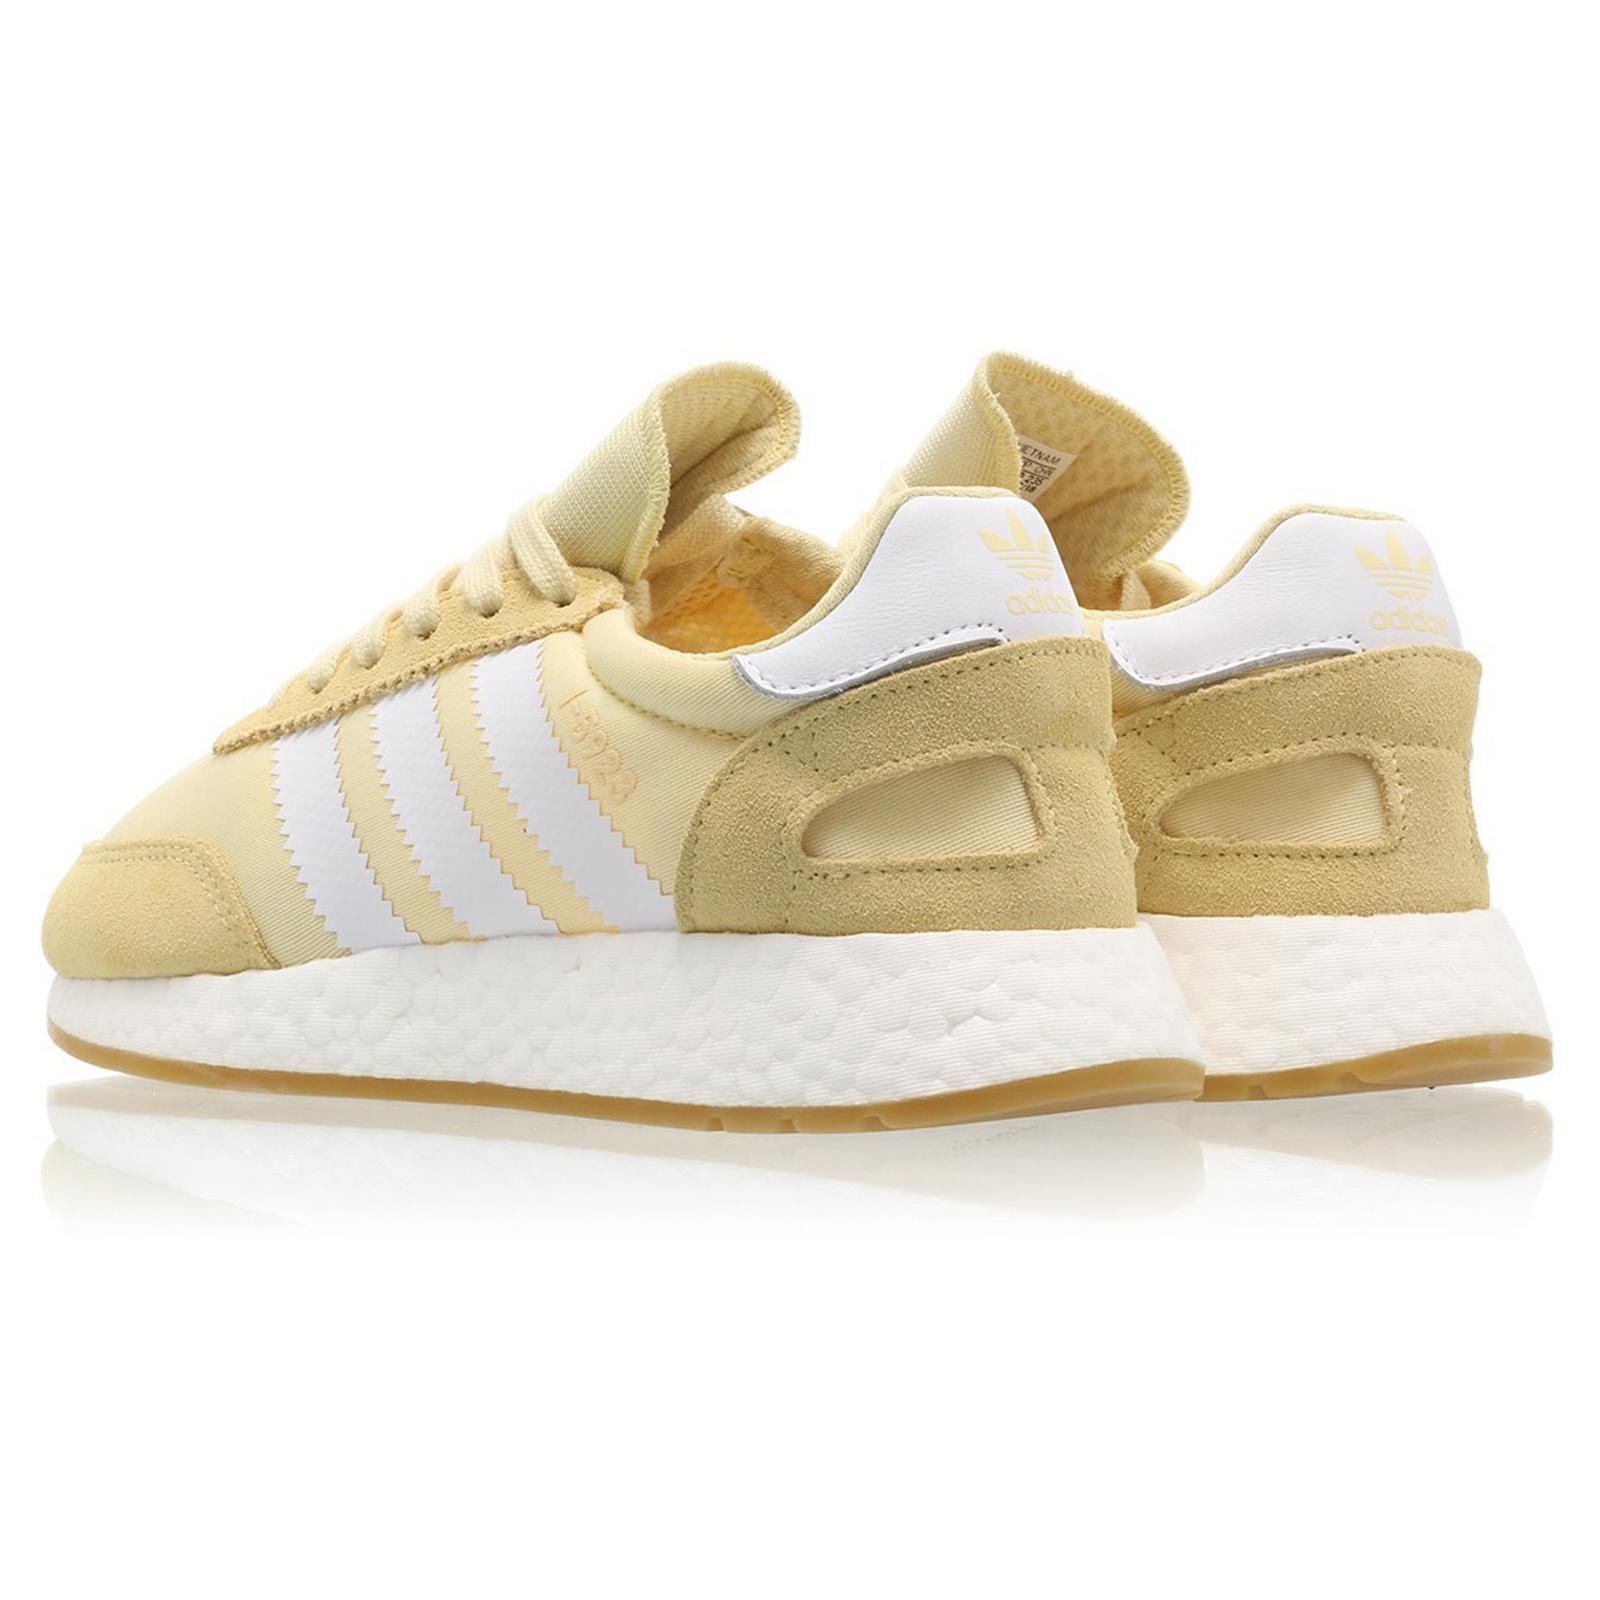 Scarpe da ginnastica Adidas Originals I 5923 in pelle giallo